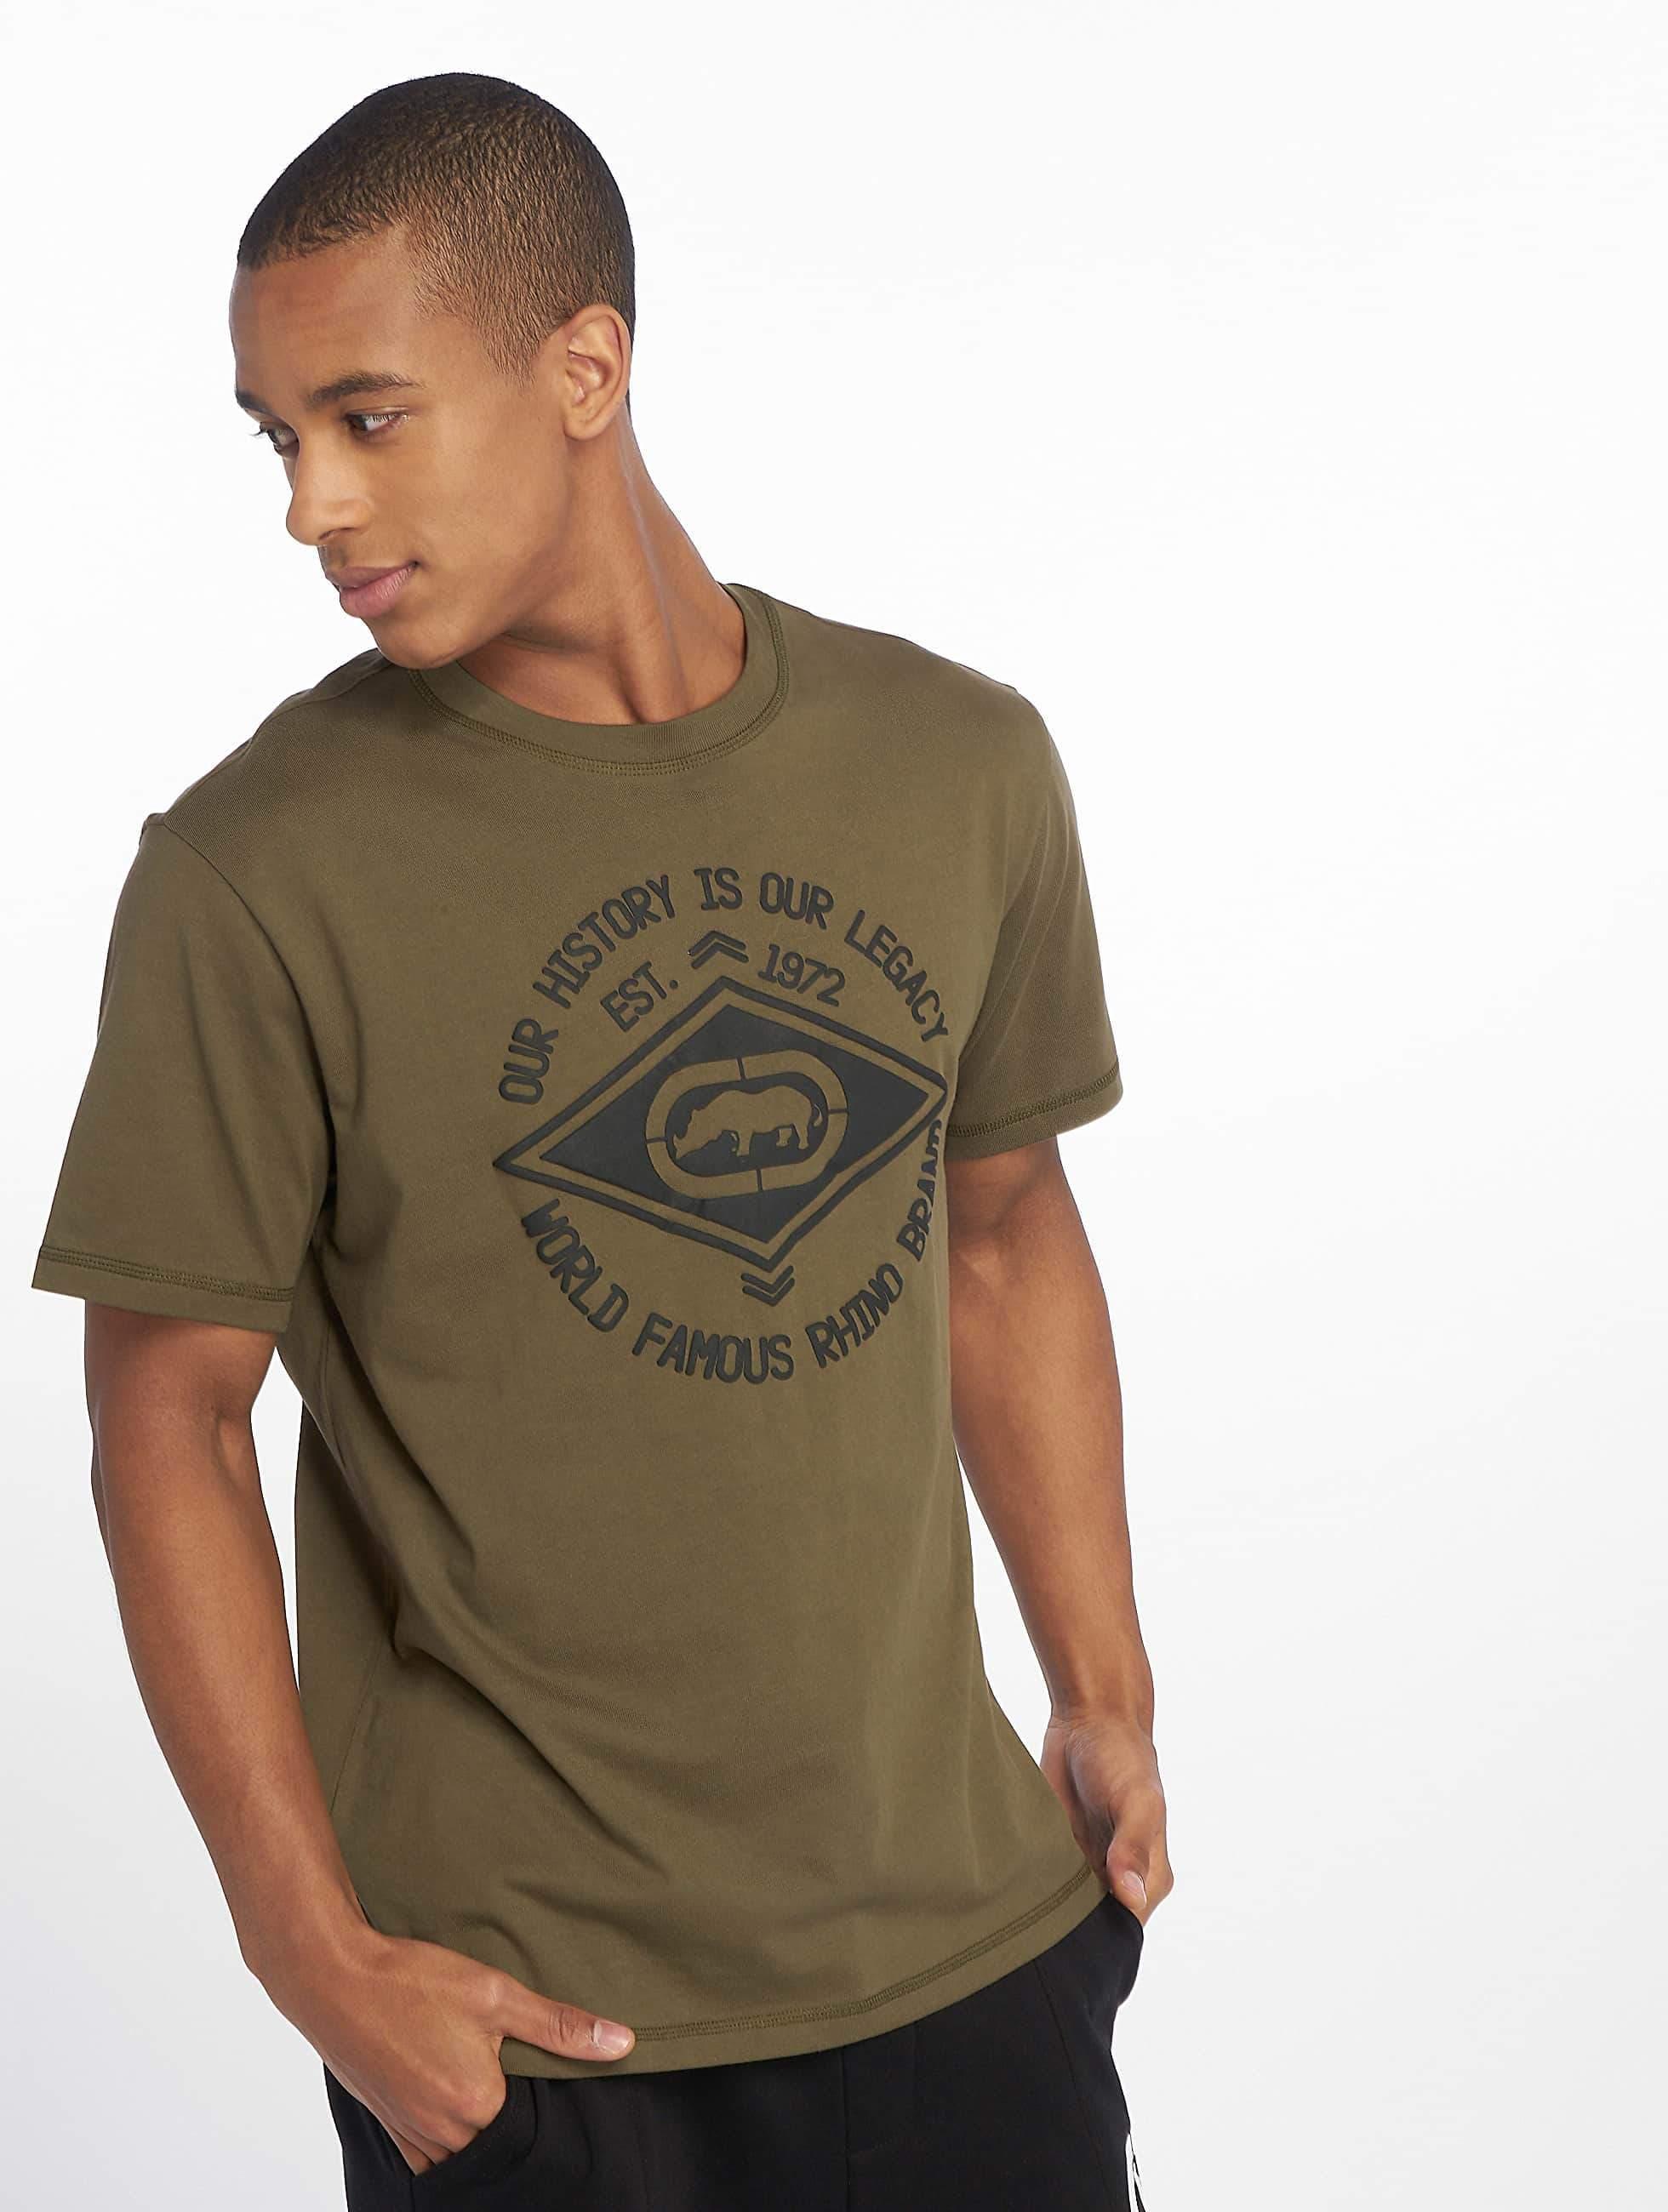 Ecko Unltd. / T-Shirt Inglewood in olive S